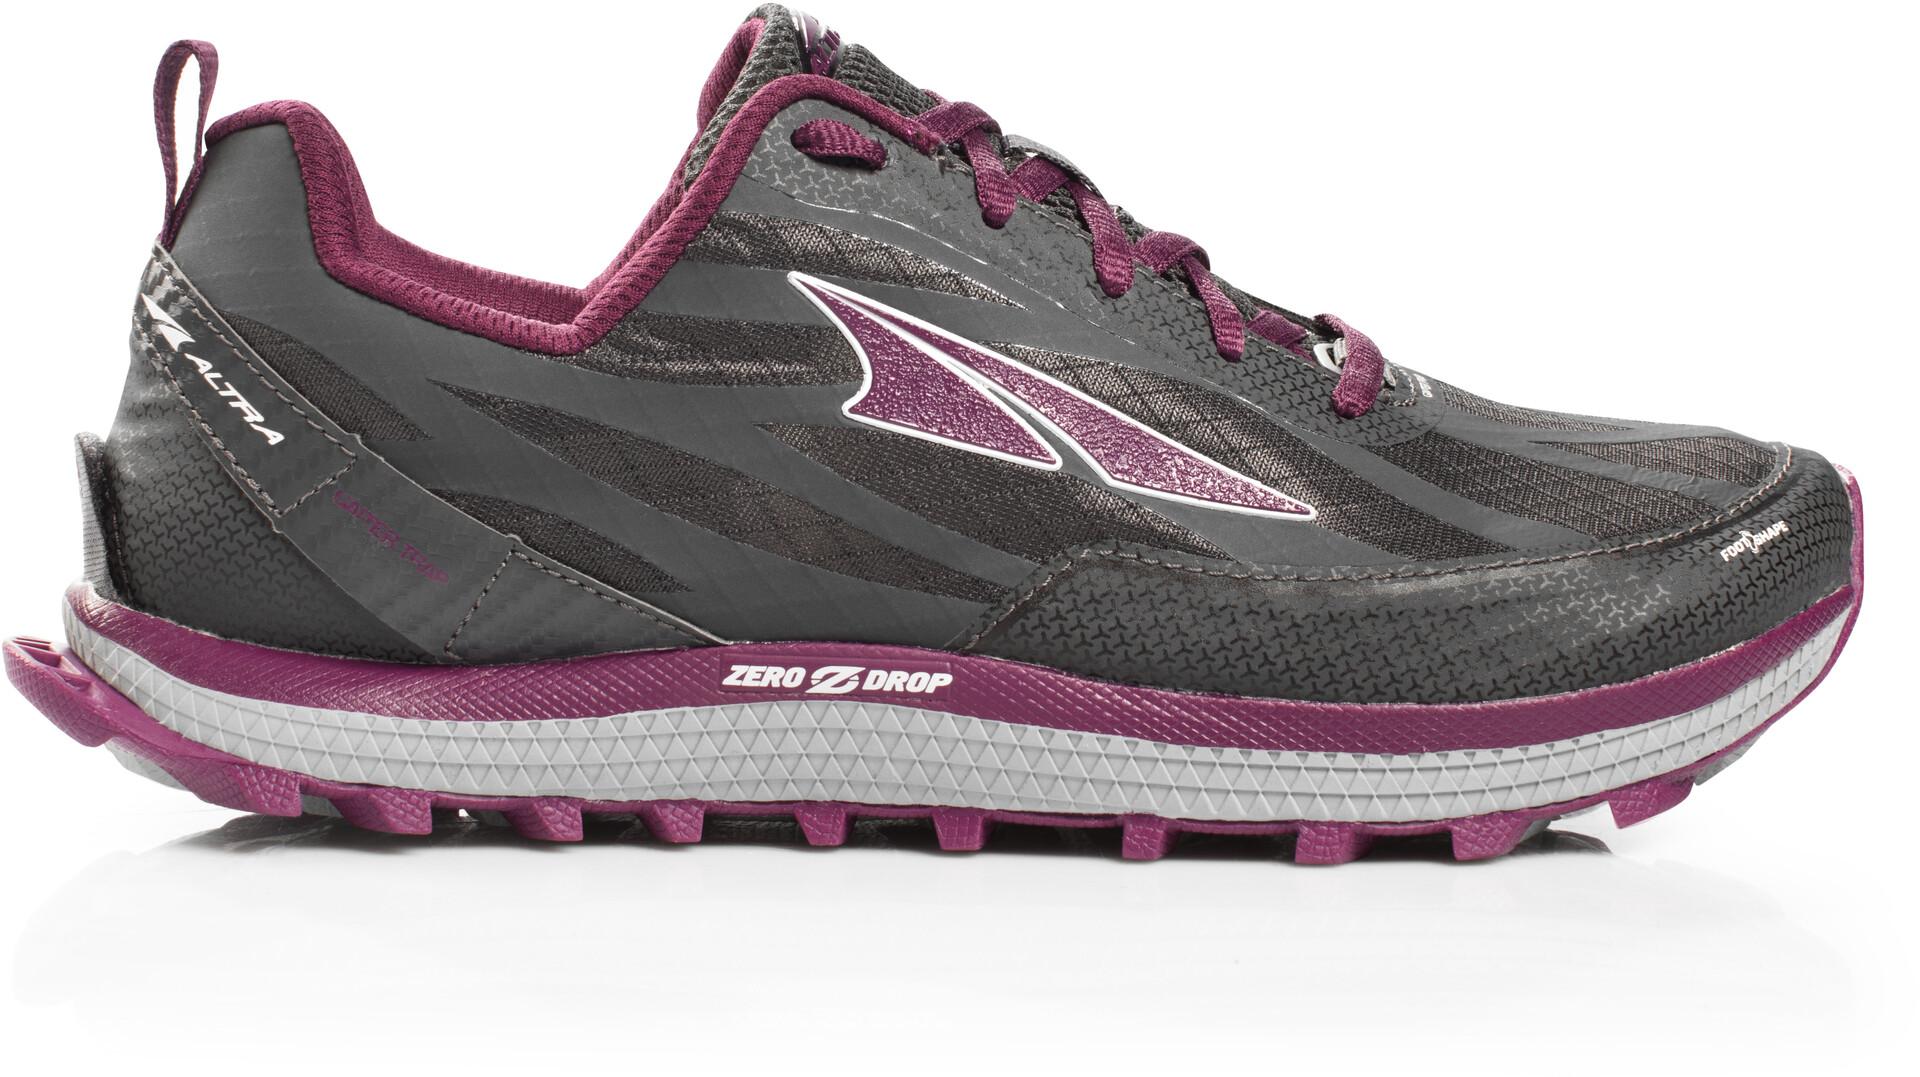 Altra W's Superior 3.5 Trail Running Shoes grå/purple grå/purple grå/purple a9003a